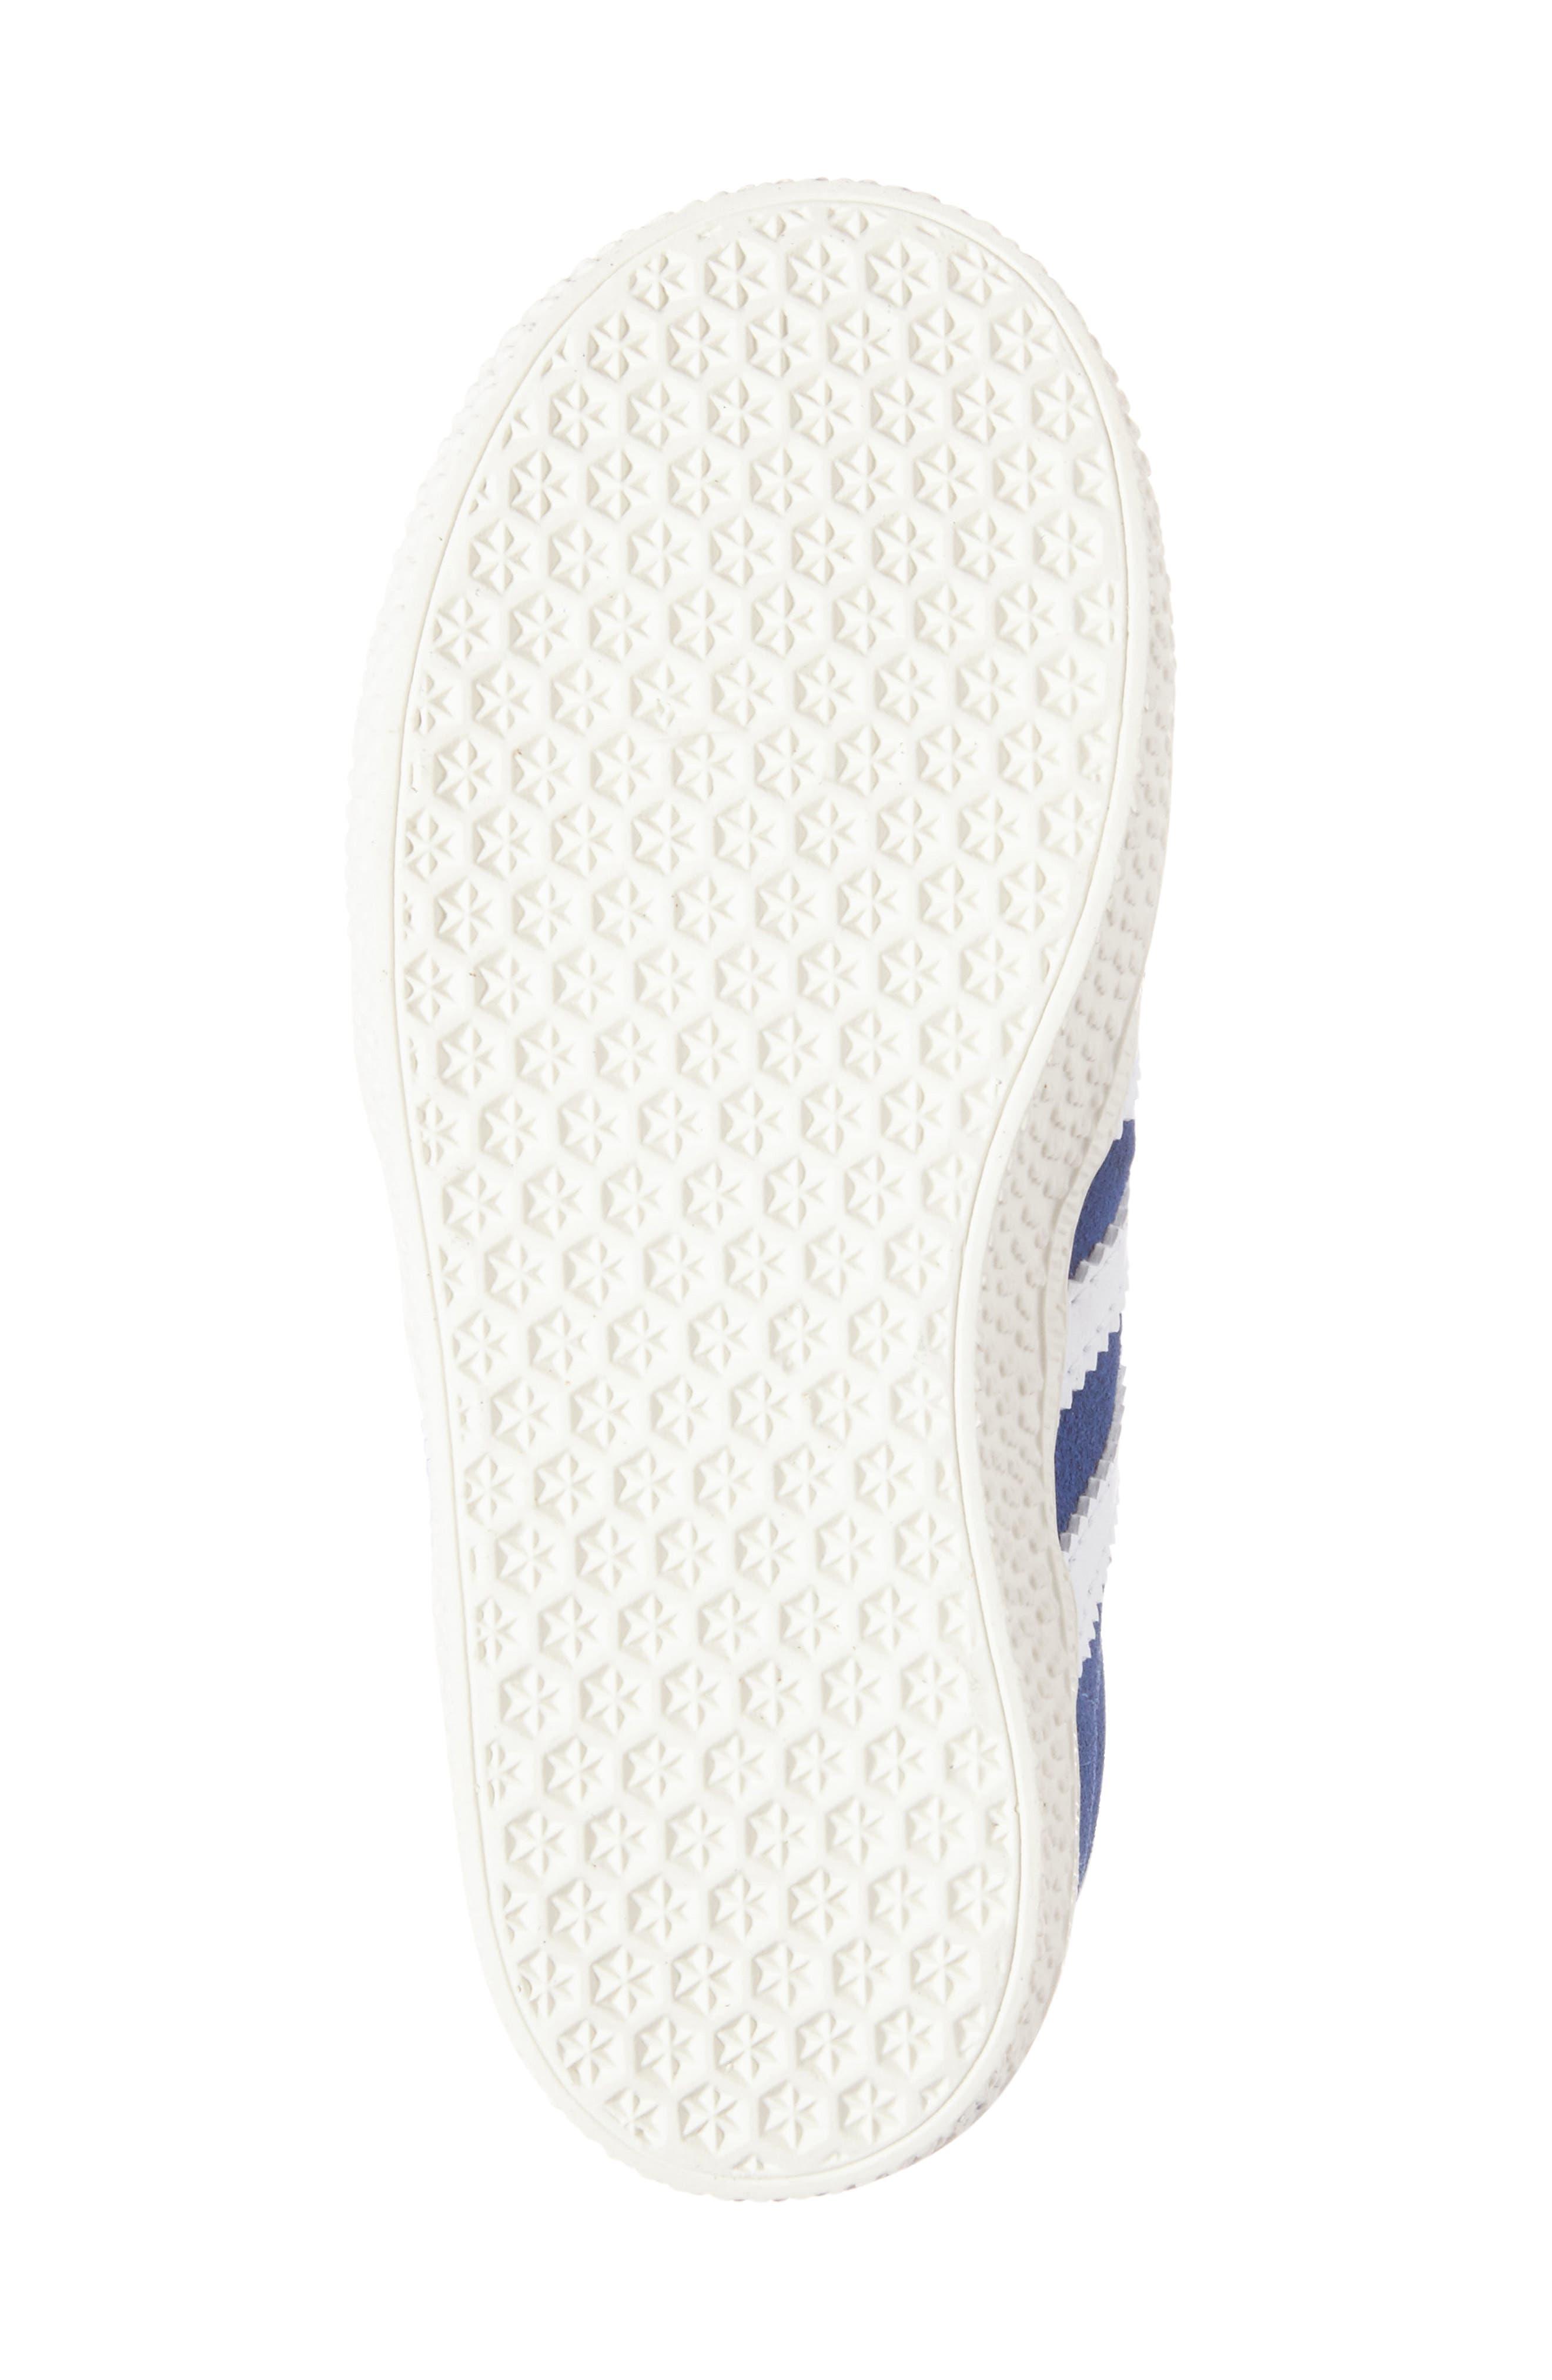 Gazelle Sneaker,                             Alternate thumbnail 6, color,                             Blue/ White/ Gold Metallic